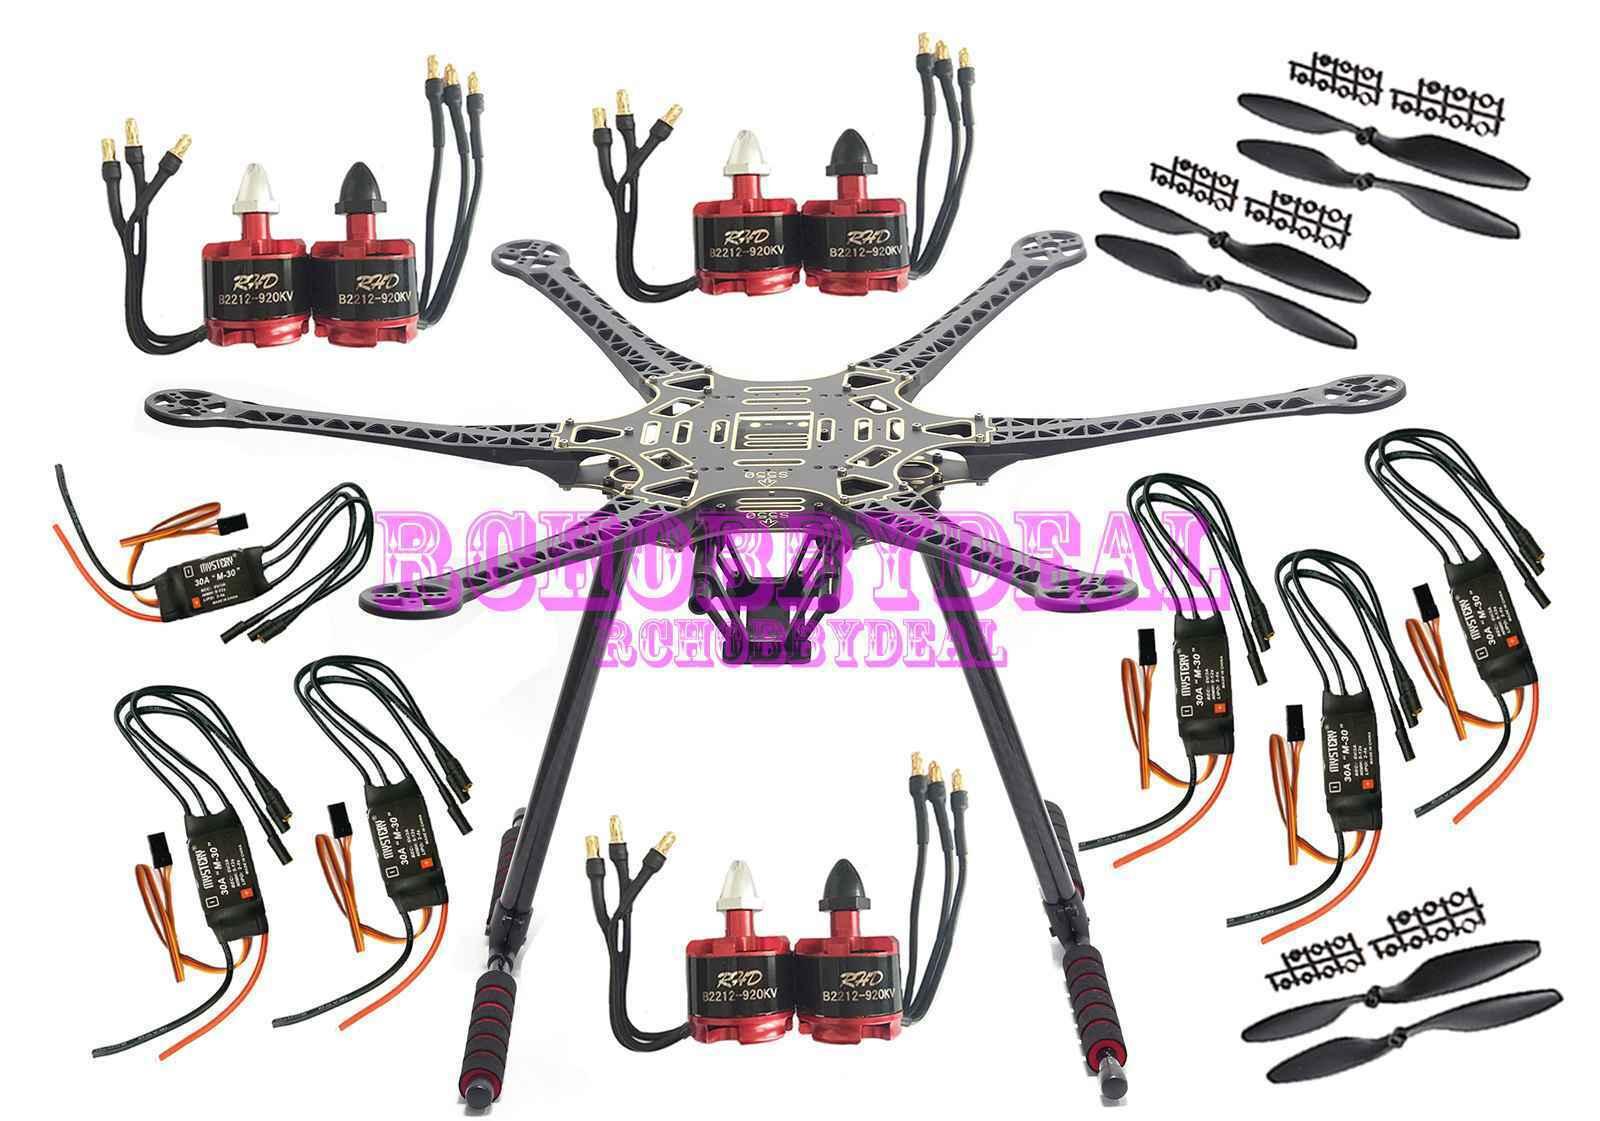 S550 F550 Carbon Fiber Hexacopter Rahmen Kit mit 6 Satz Motor und Regler D